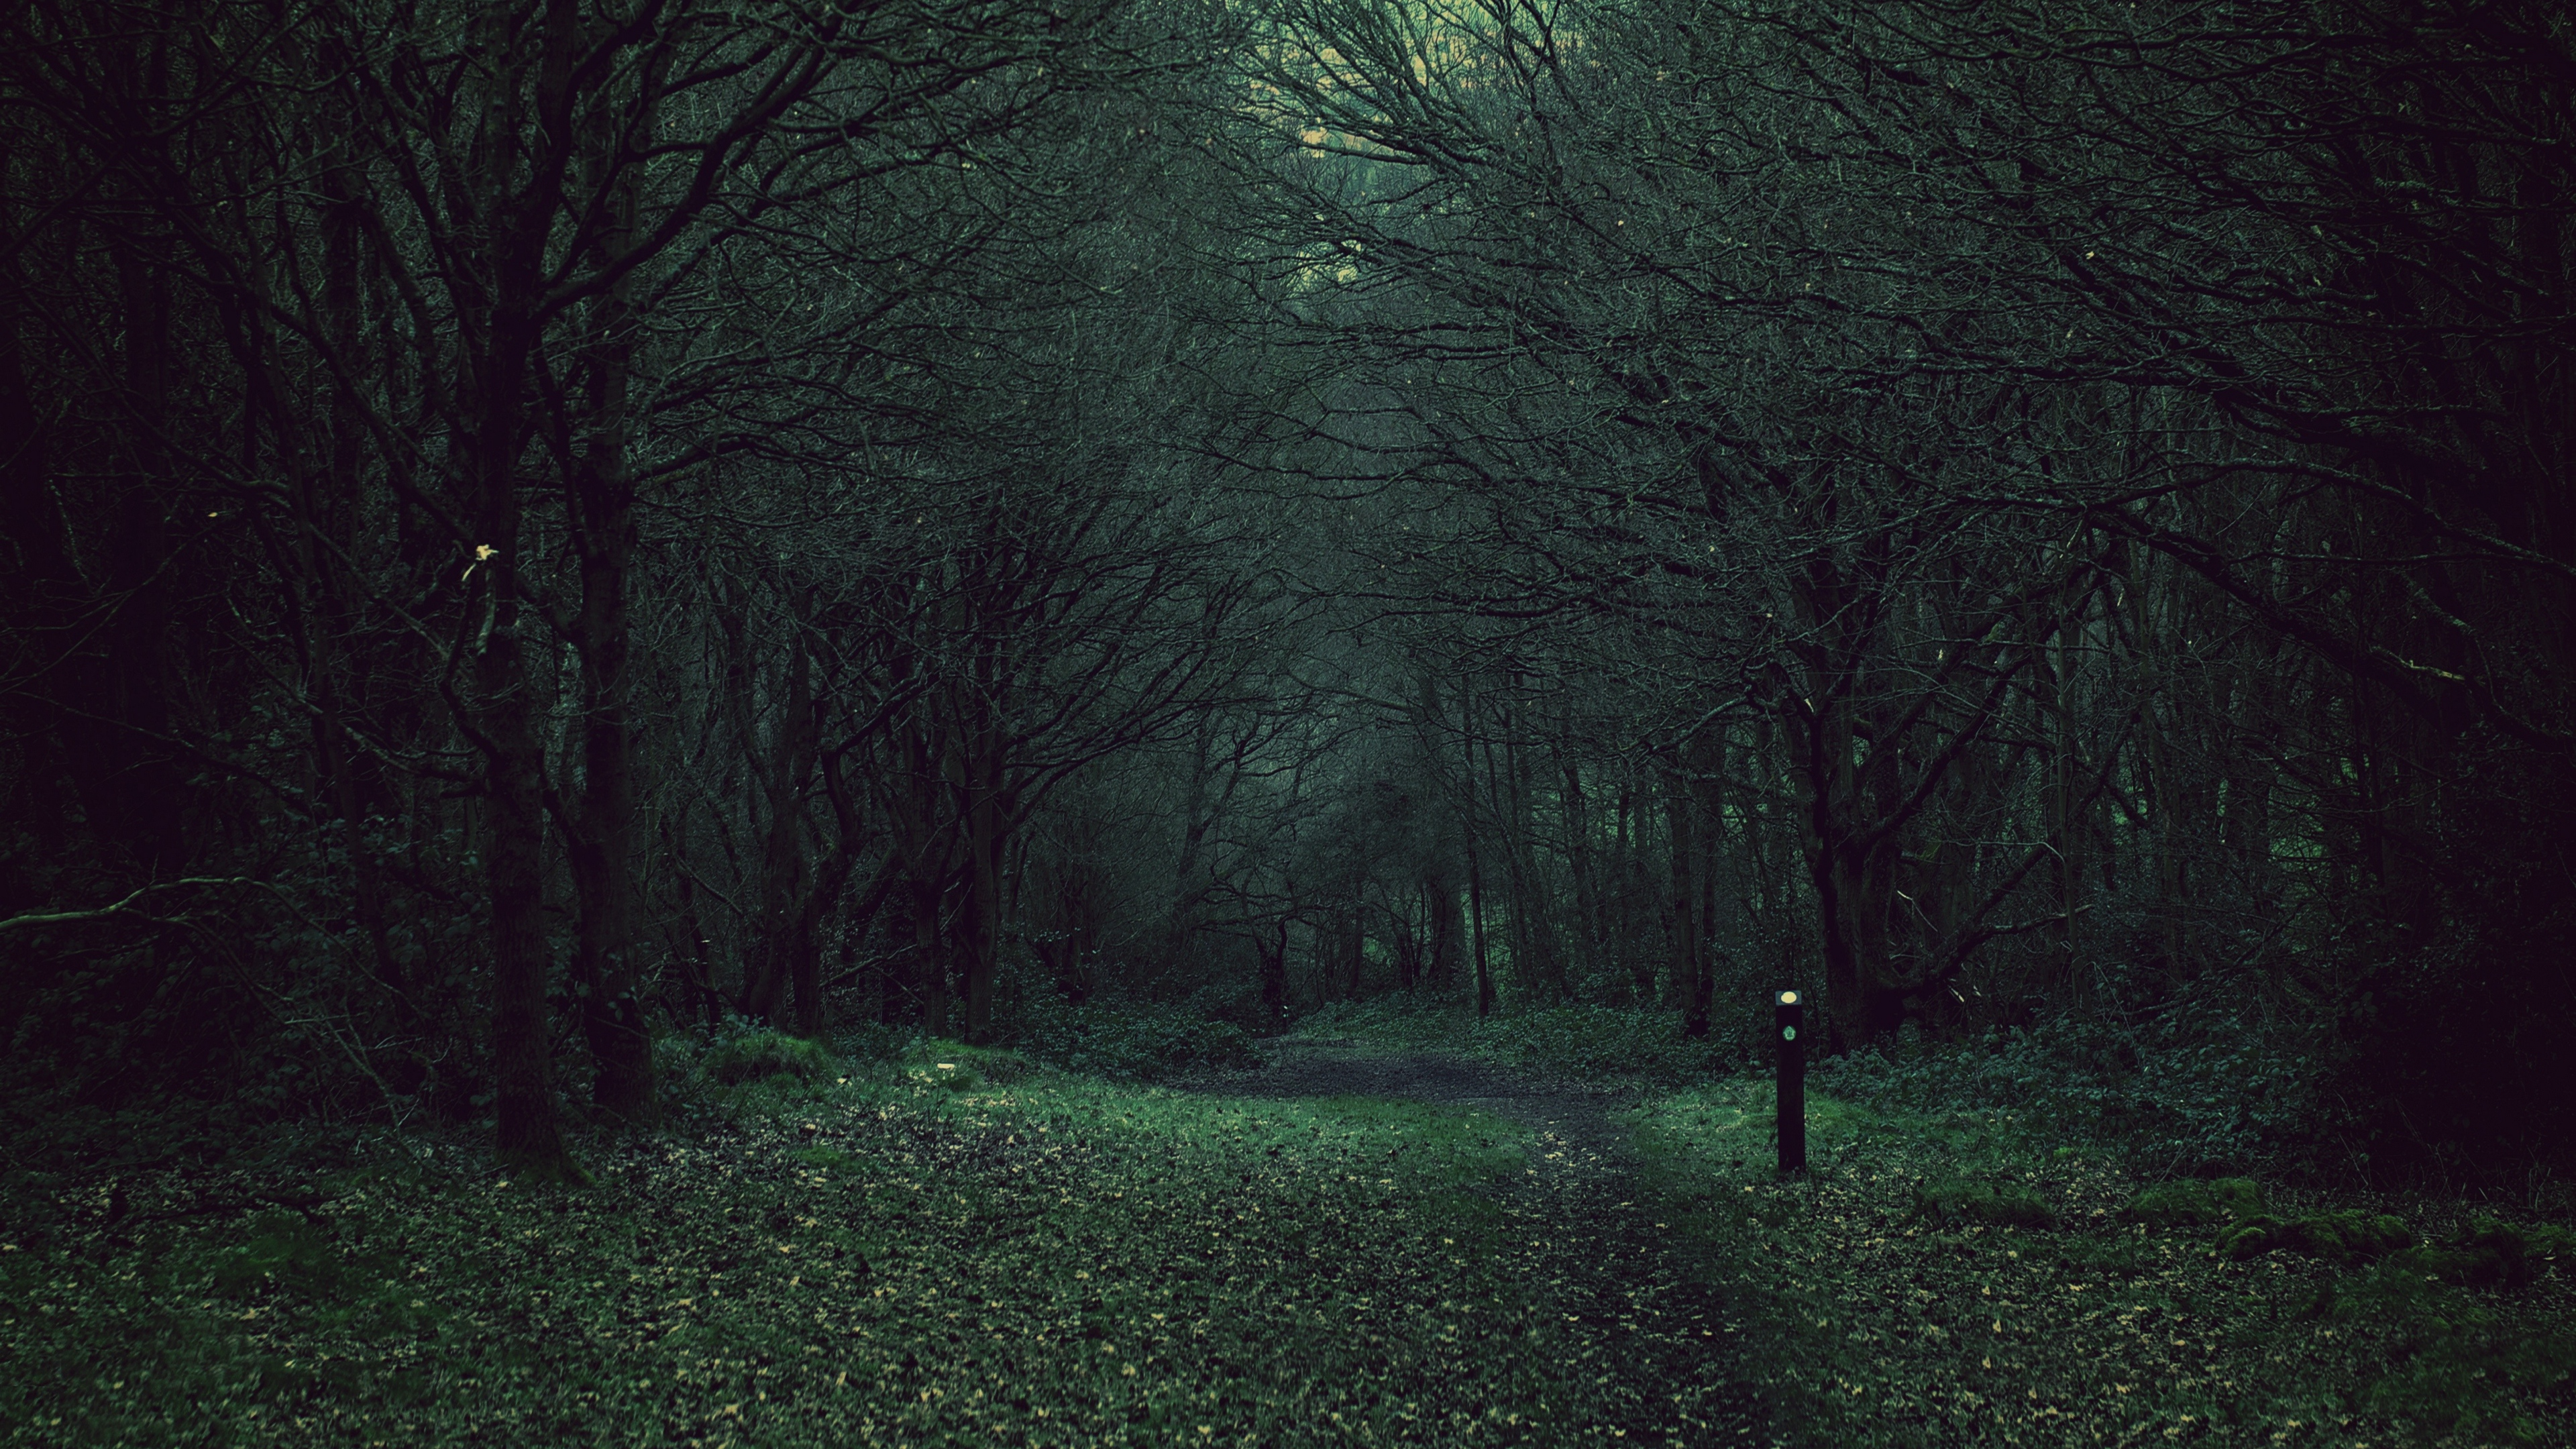 forest trees gloomy foliage fallen 4k 1541117905 - forest, trees, gloomy, foliage, fallen 4k - Trees, gloomy, Forest